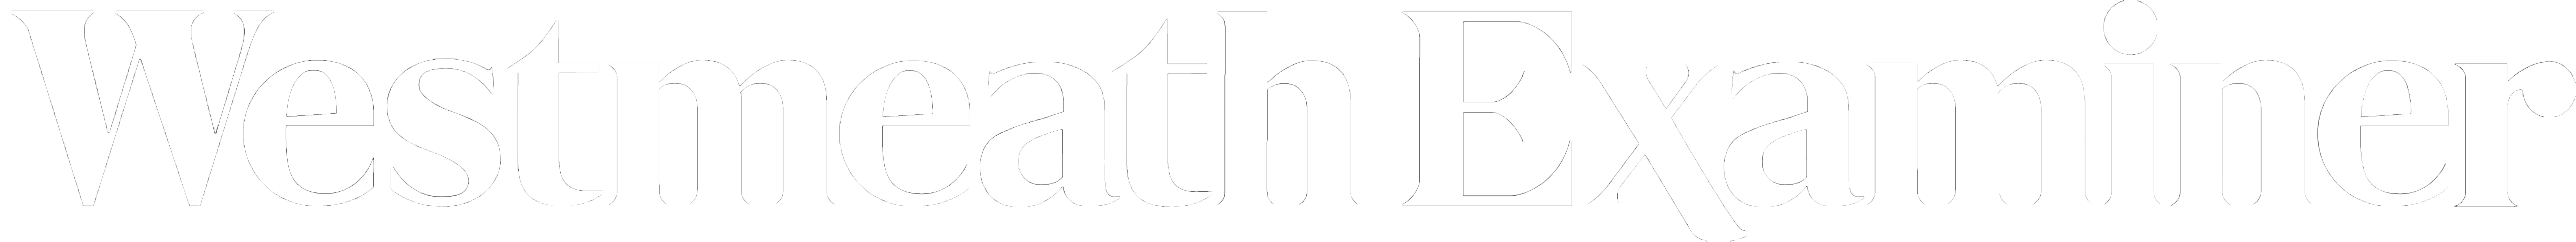 Westmeath Examiner logo